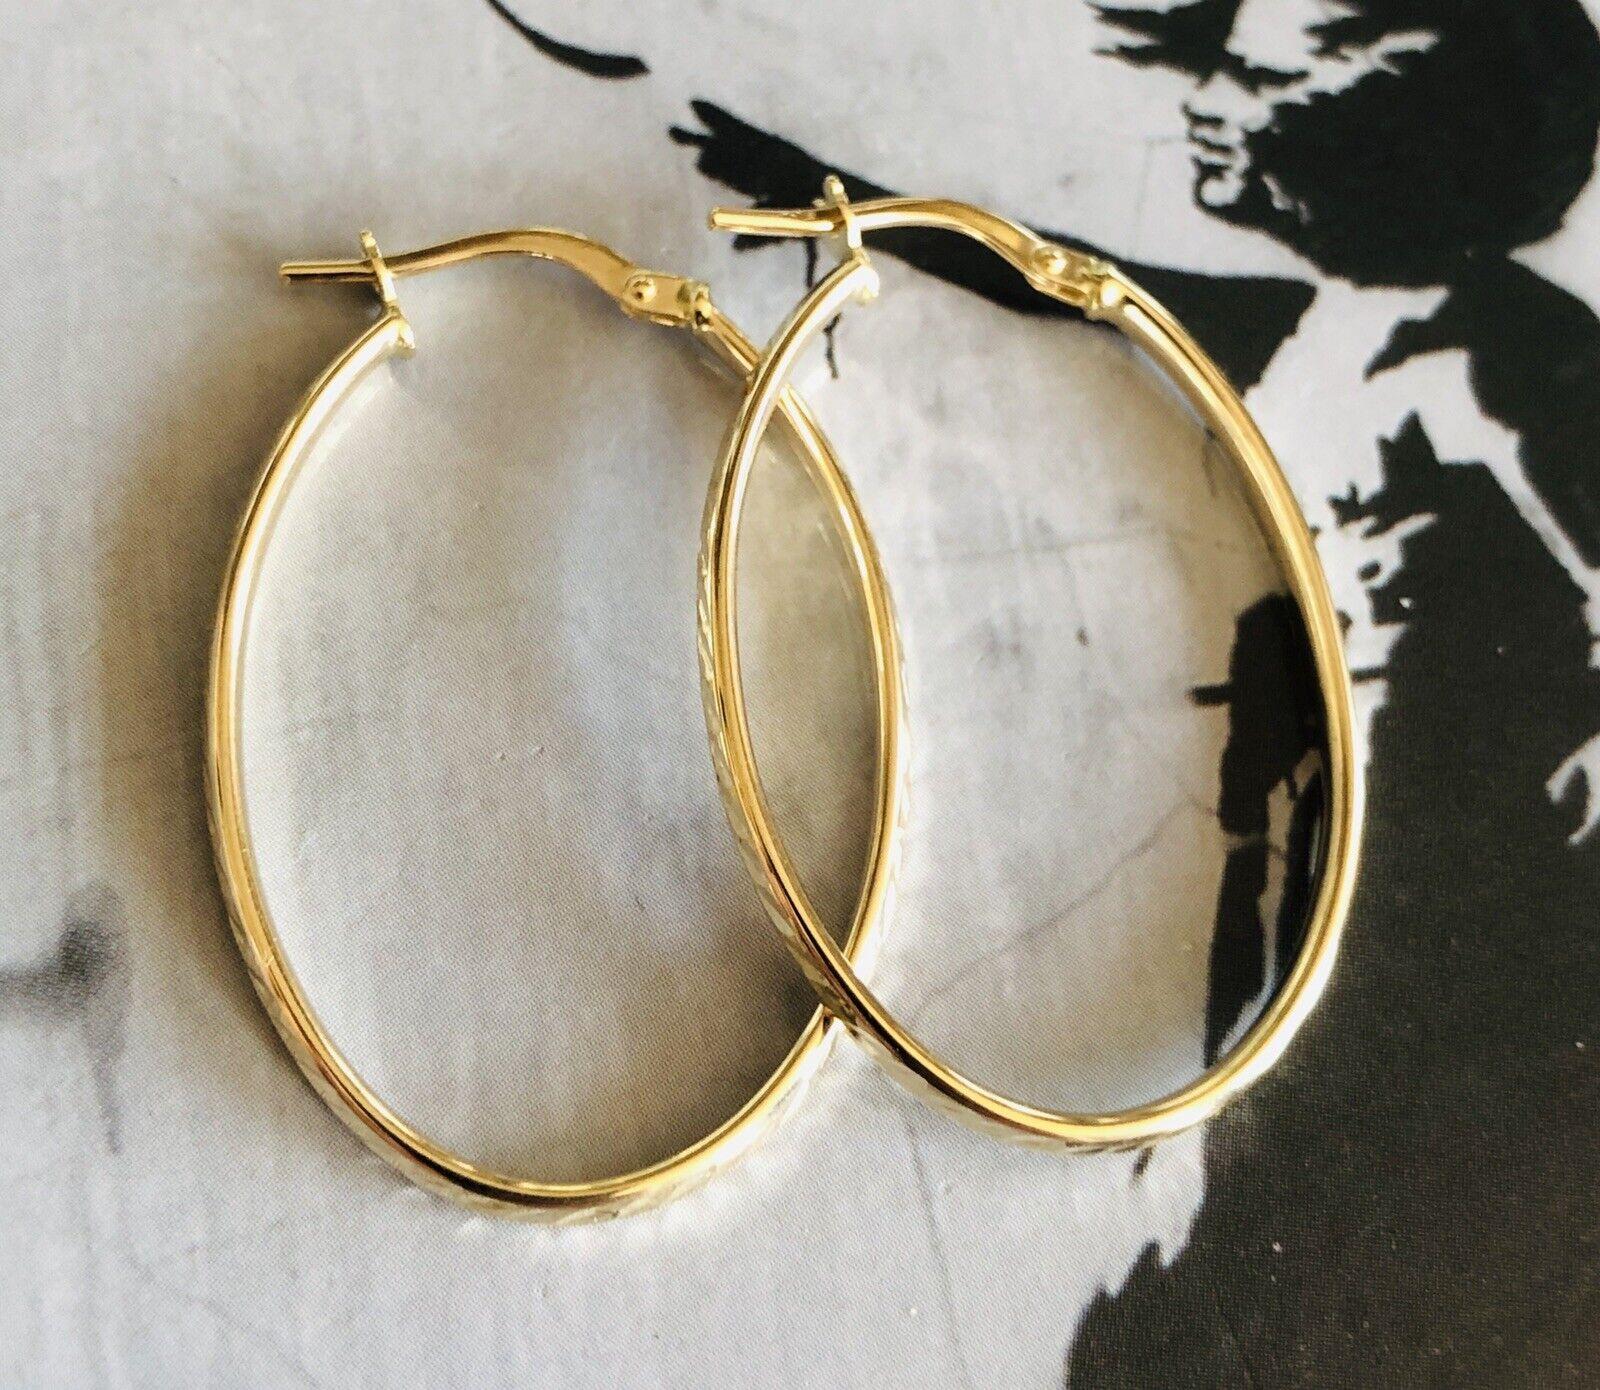 9ct gold Large big Oval Hoop Fancy Earrings - Th898 Th899